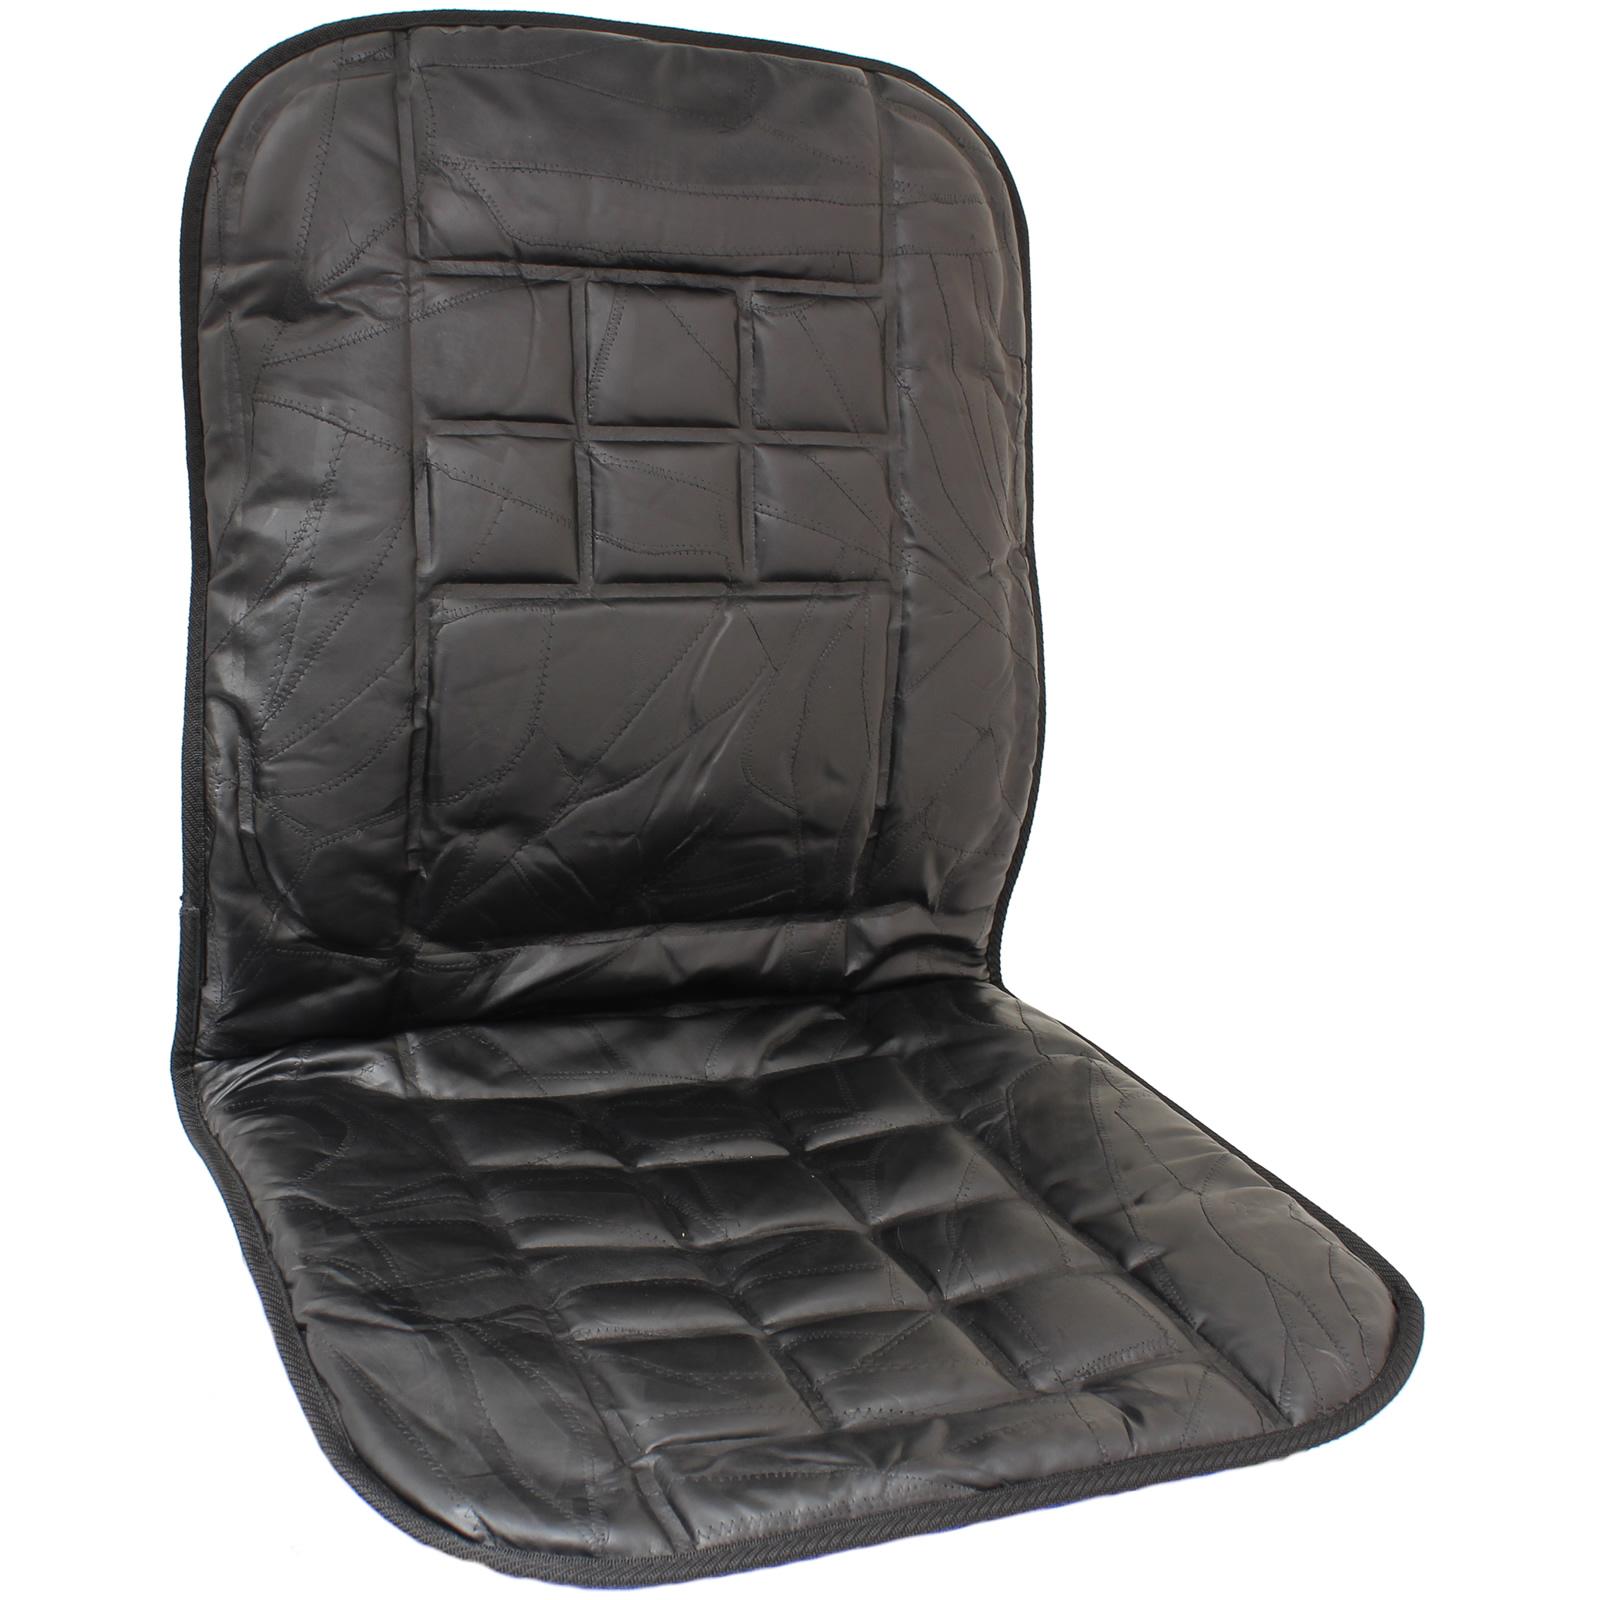 Car Seat Cover Dimensions